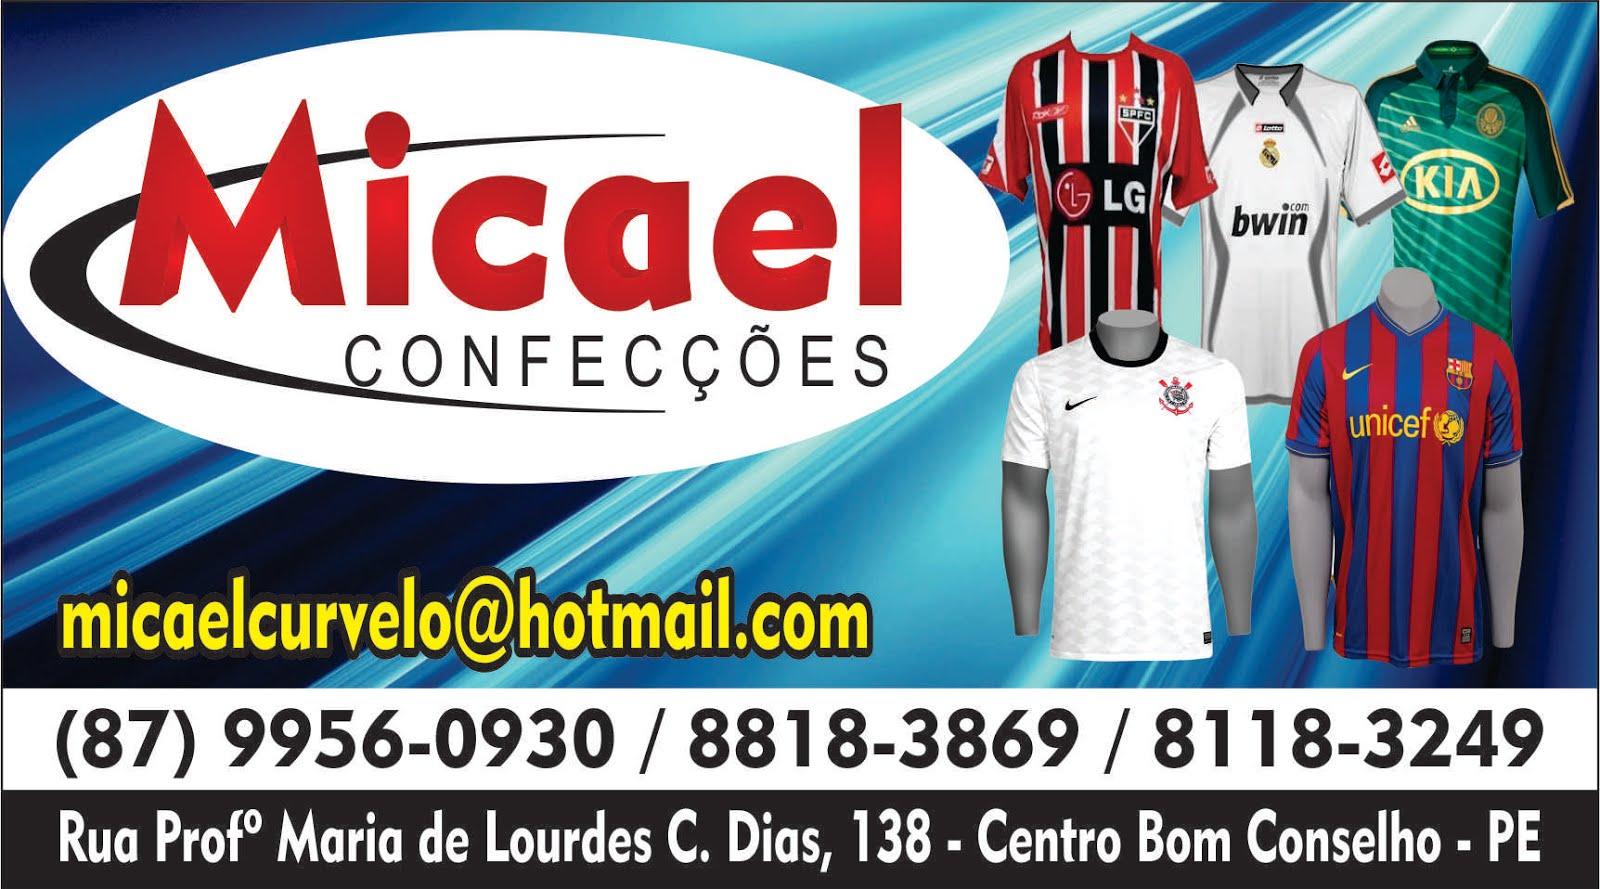 MICAEL CURVELO